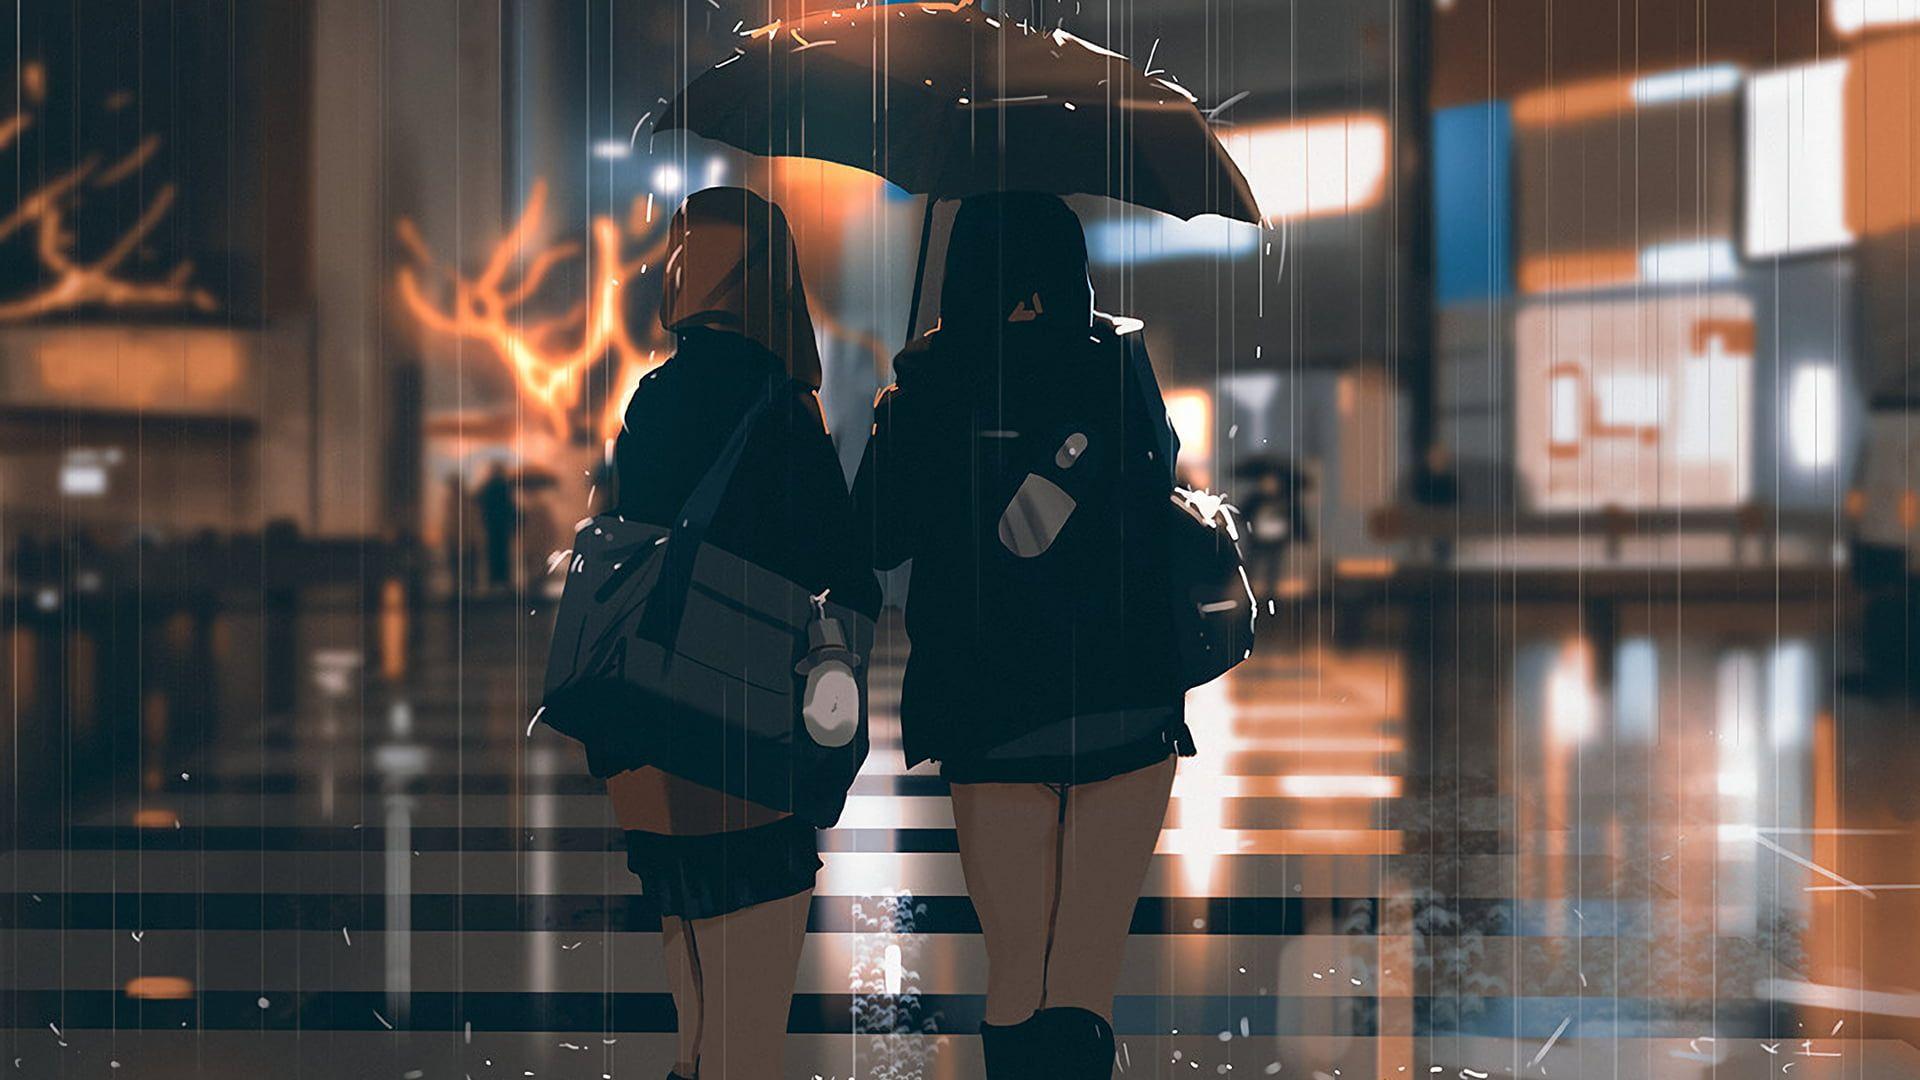 Person Holding Umbrella Illustration Digital Art Rain Road Women Umbrella 1080p Wallpaper Hdwallpaper De Ilustrasi Karakter Ilustrasi Fantasi Ilustrasi